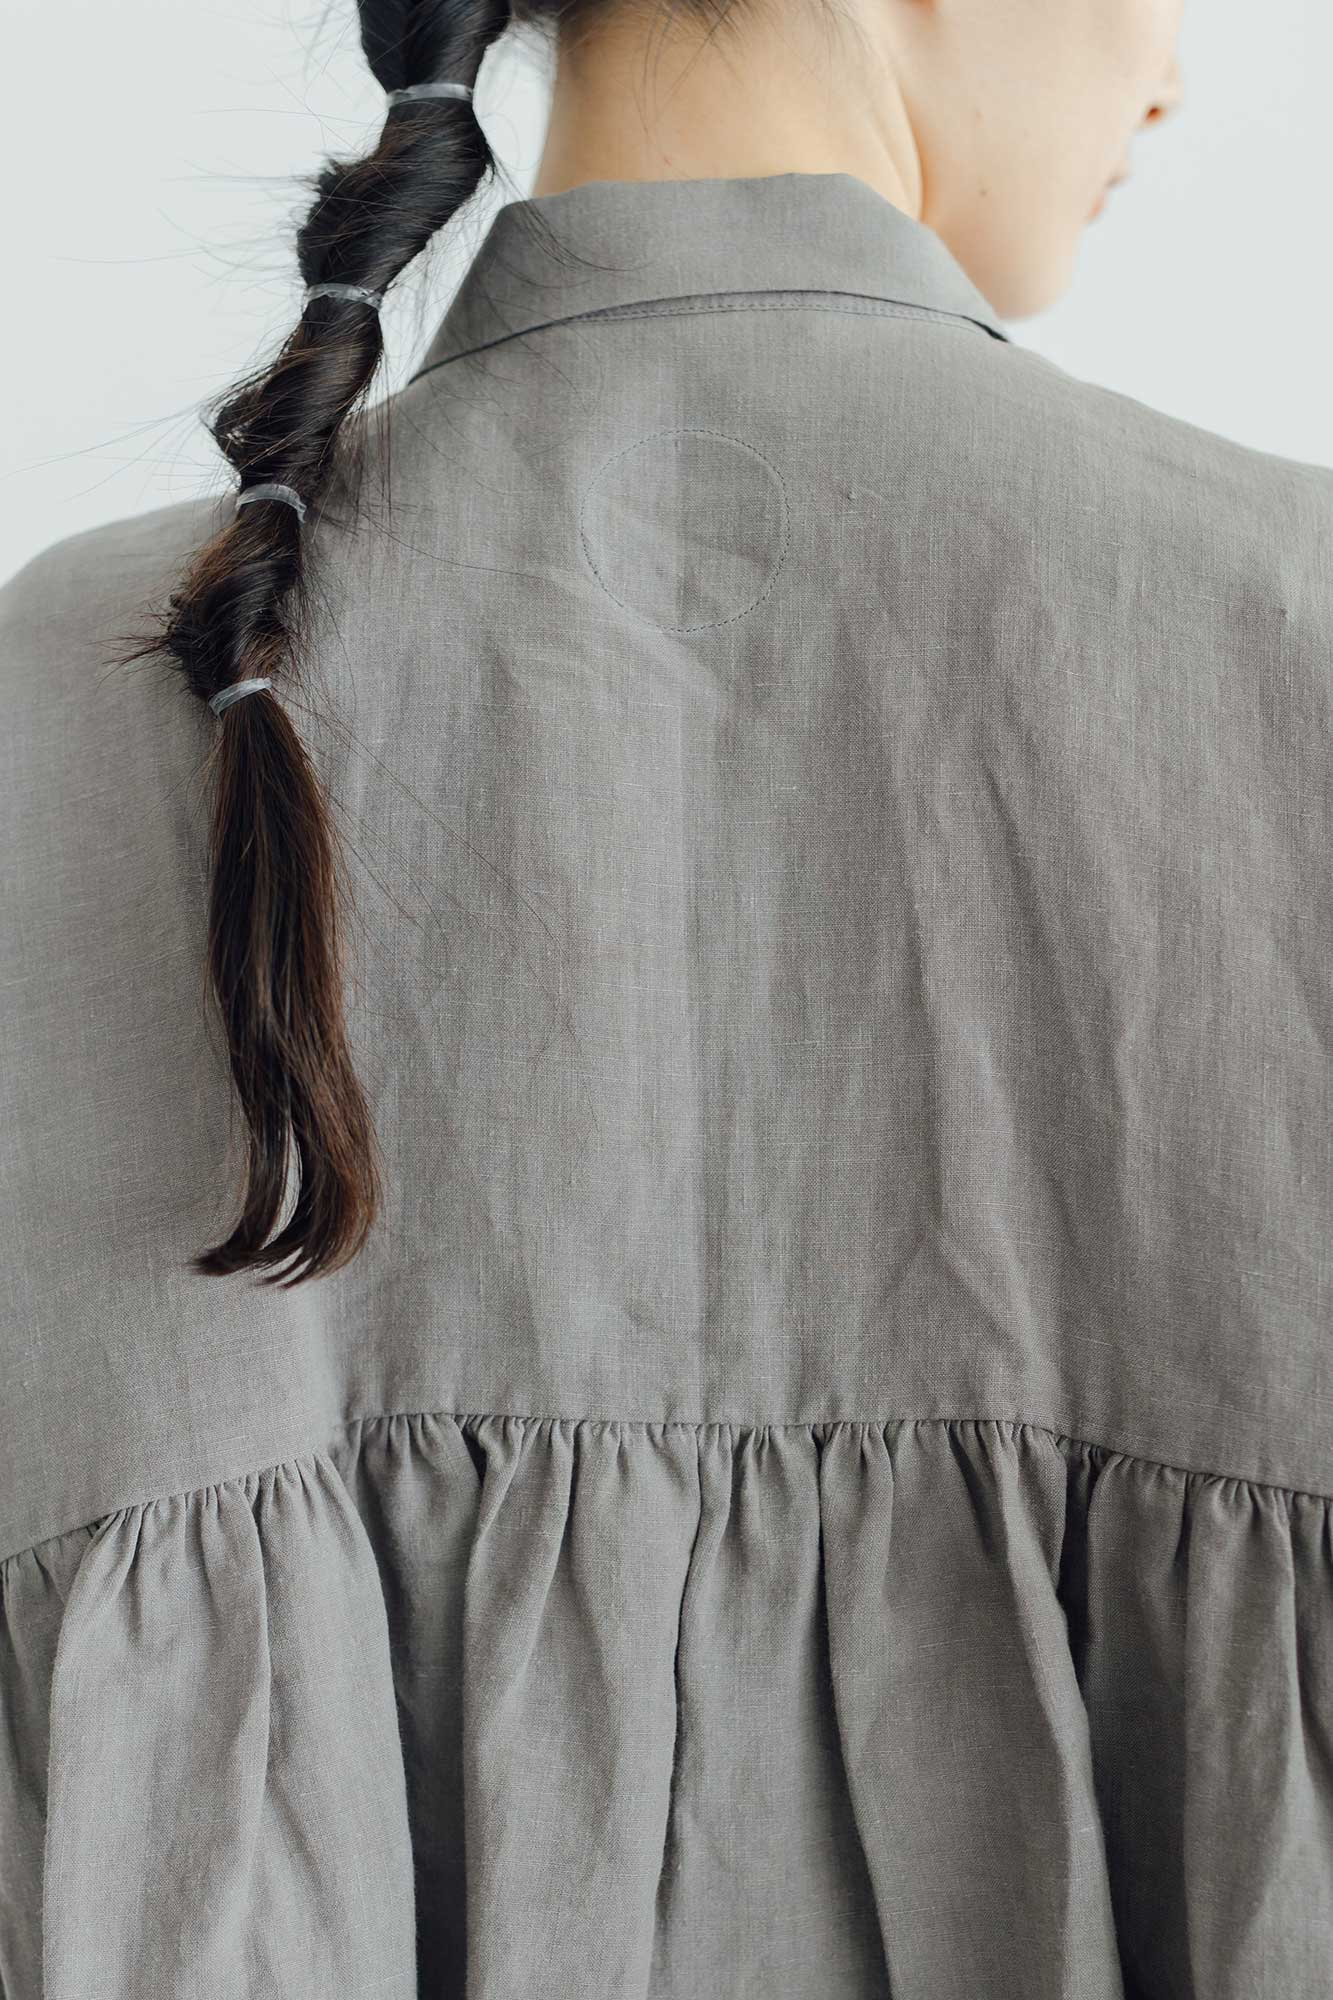 Atelier d'antan Breton リネン シャツ グレー